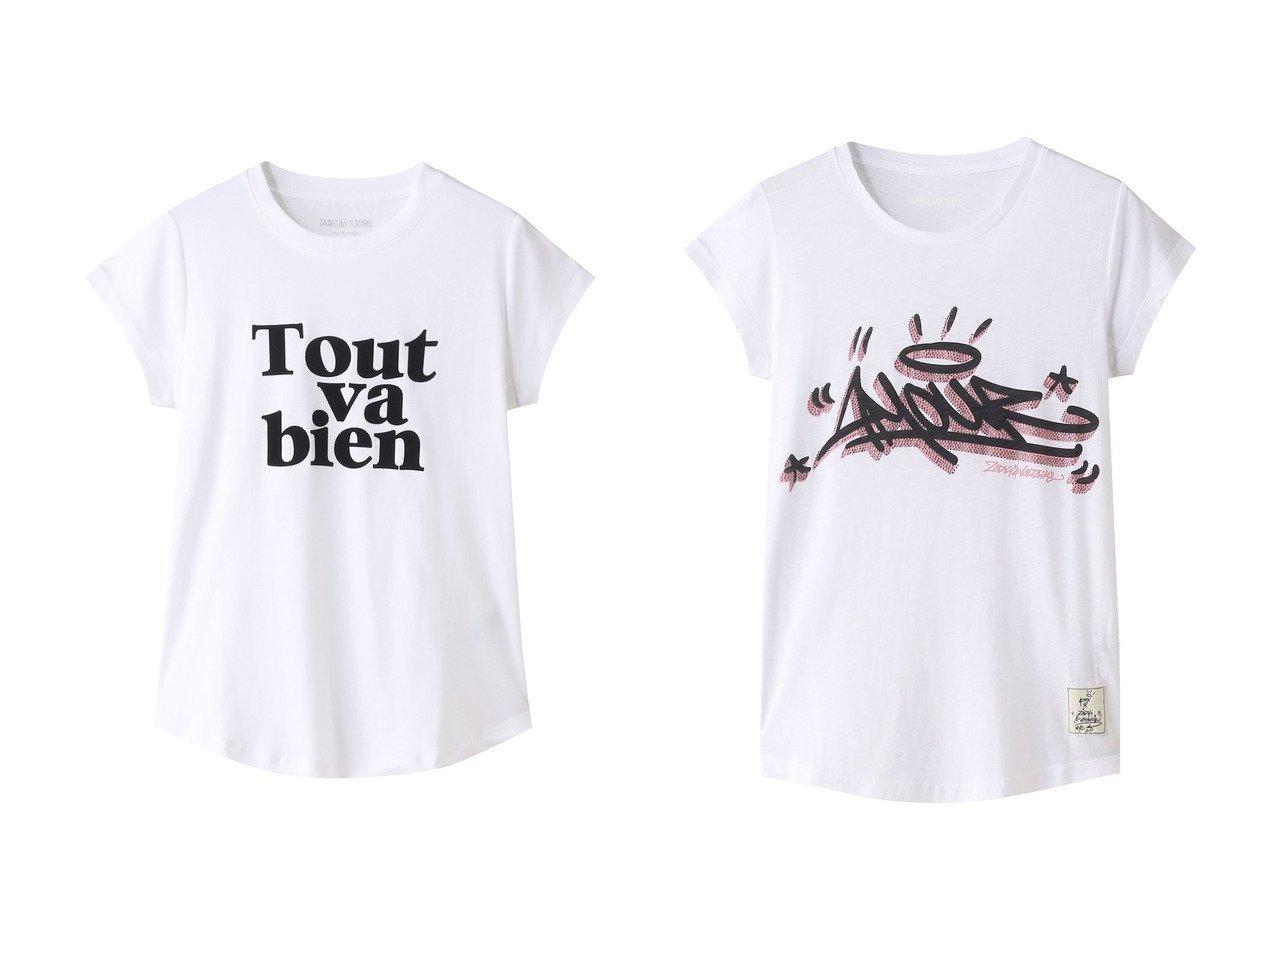 【ZADIG & VOLTAIRE/ザディグ エ ヴォルテール】のWOOP TOUT VA BIEN SPI T-SHIRT FLOCK Tシャツ&SKINNY AMOUR JORMI STRASS T-MODAL Tシャツ 【トップス・カットソー】おすすめ!人気、トレンド・レディースファッションの通販   おすすめで人気の流行・トレンド、ファッションの通販商品 メンズファッション・キッズファッション・インテリア・家具・レディースファッション・服の通販 founy(ファニー) https://founy.com/ ファッション Fashion レディースファッション WOMEN トップス・カットソー Tops/Tshirt シャツ/ブラウス Shirts/Blouses ロング / Tシャツ T-Shirts カットソー Cut and Sewn 2021年 2021 2021春夏・S/S SS/Spring/Summer/2021 S/S・春夏 SS・Spring/Summer おすすめ Recommend コンパクト ショート スリーブ フロント ボトム ワイド 今季 春 Spring |ID:crp329100000026666